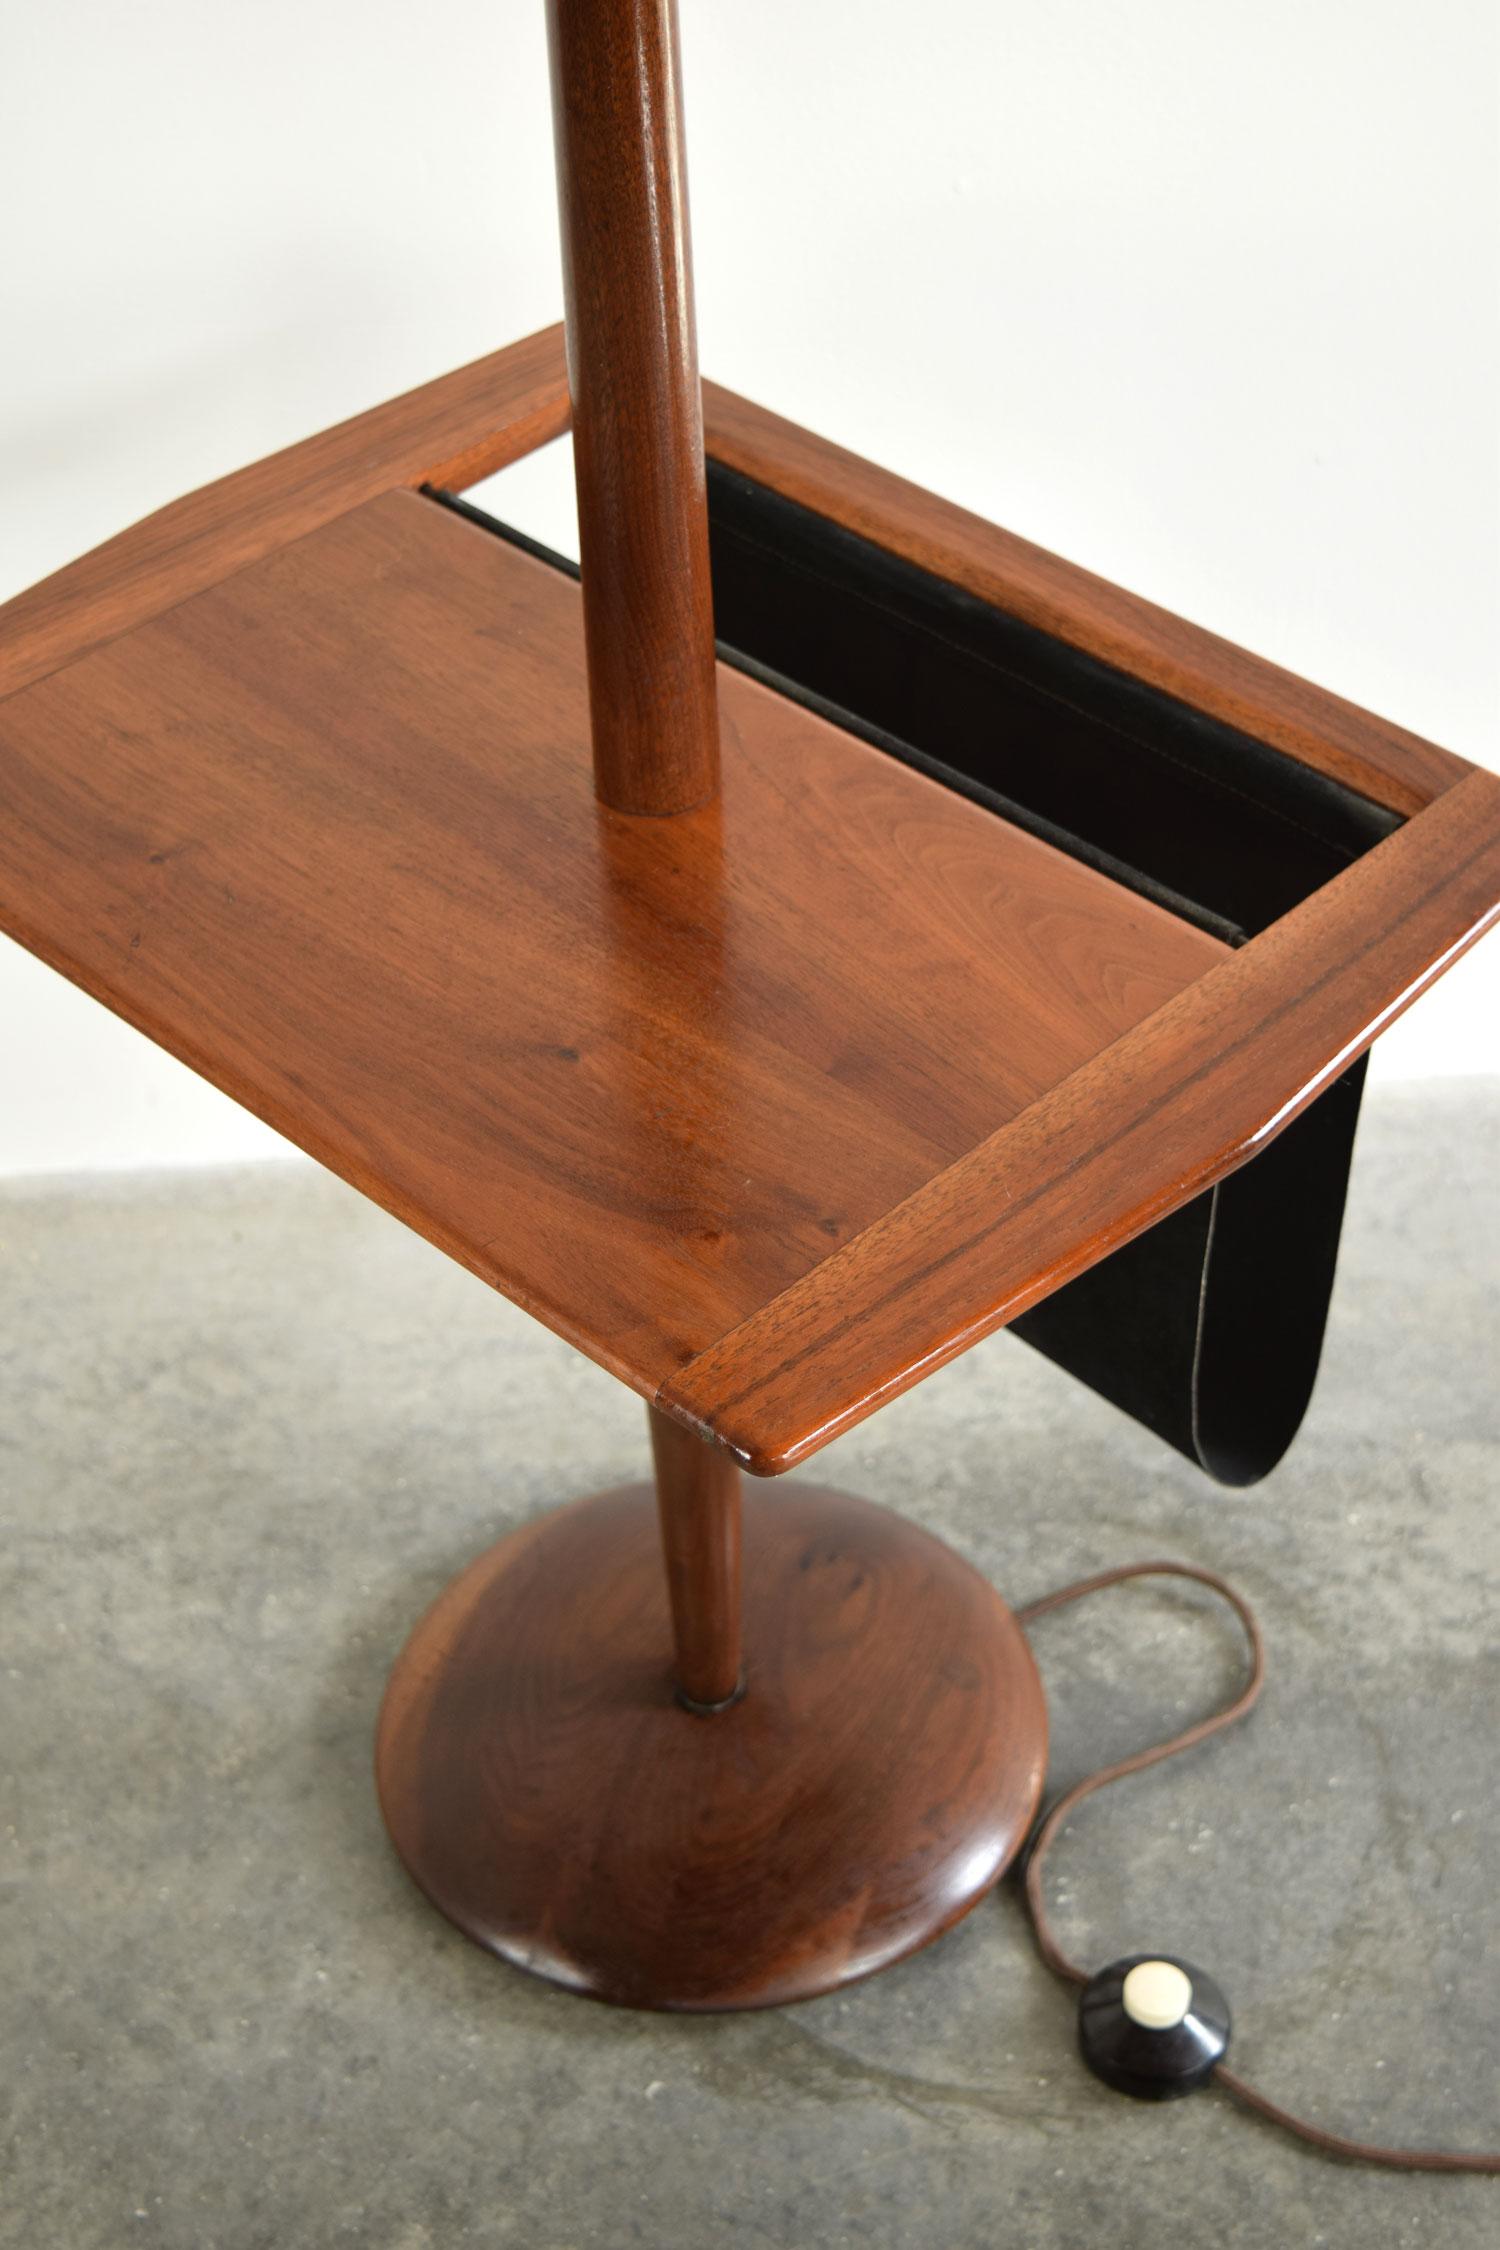 mag_table.jpg